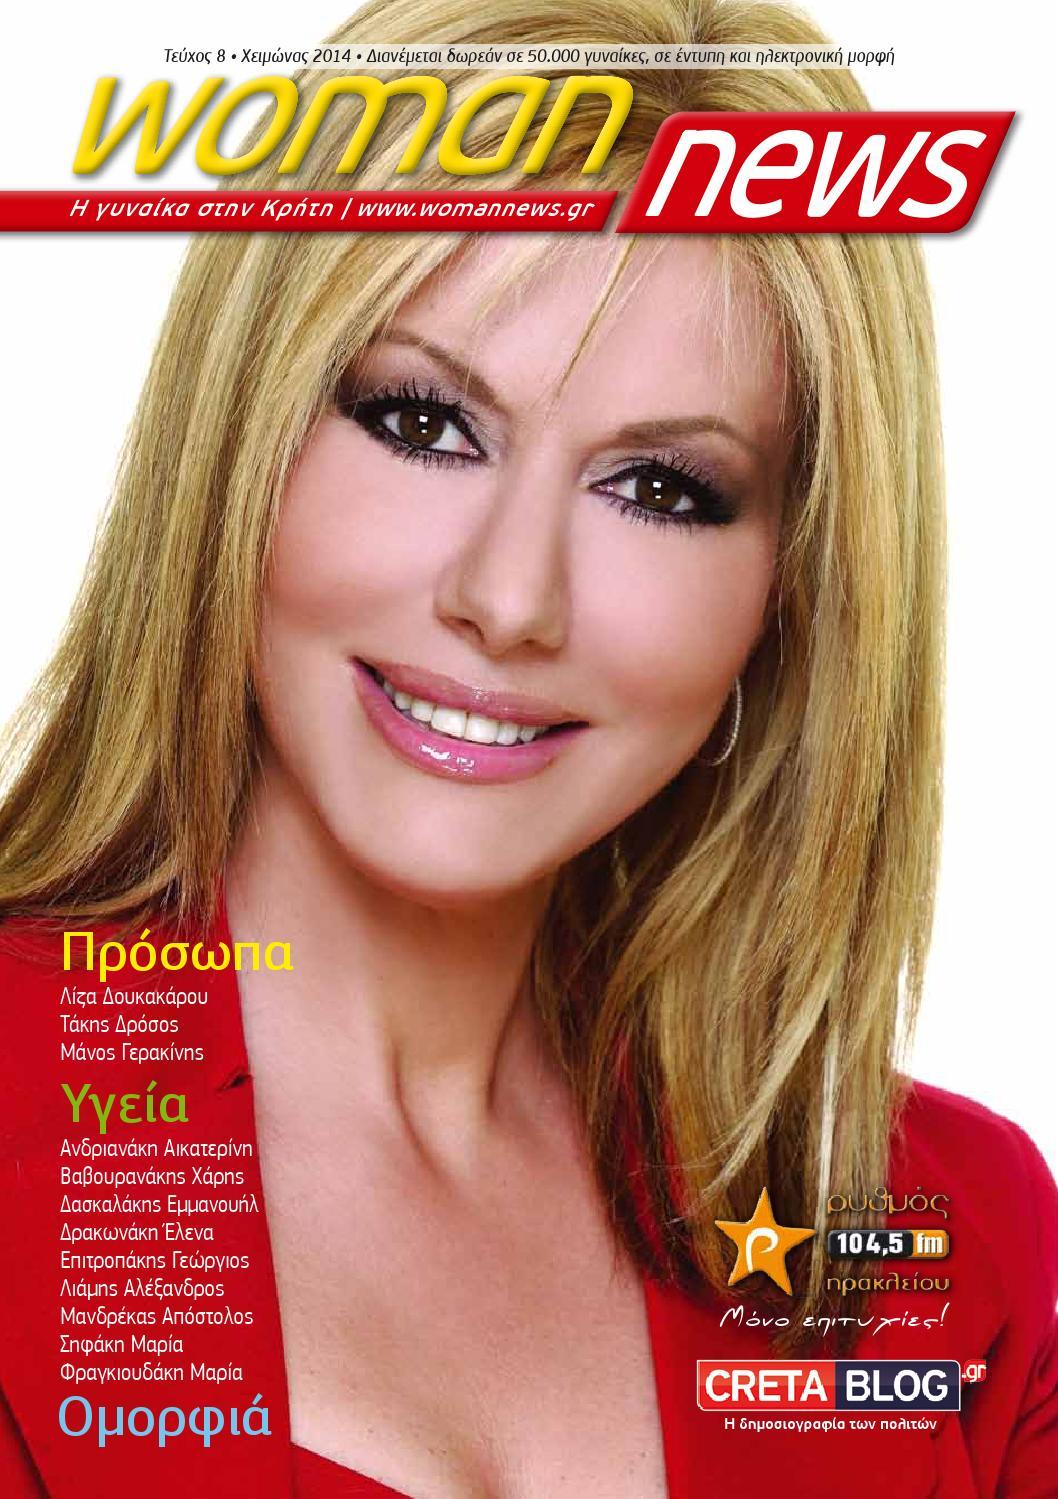 Woman News Τεύχος 8 by Epikinonies Kritis - Nektarios Sermakis - issuu 28249c0ab22